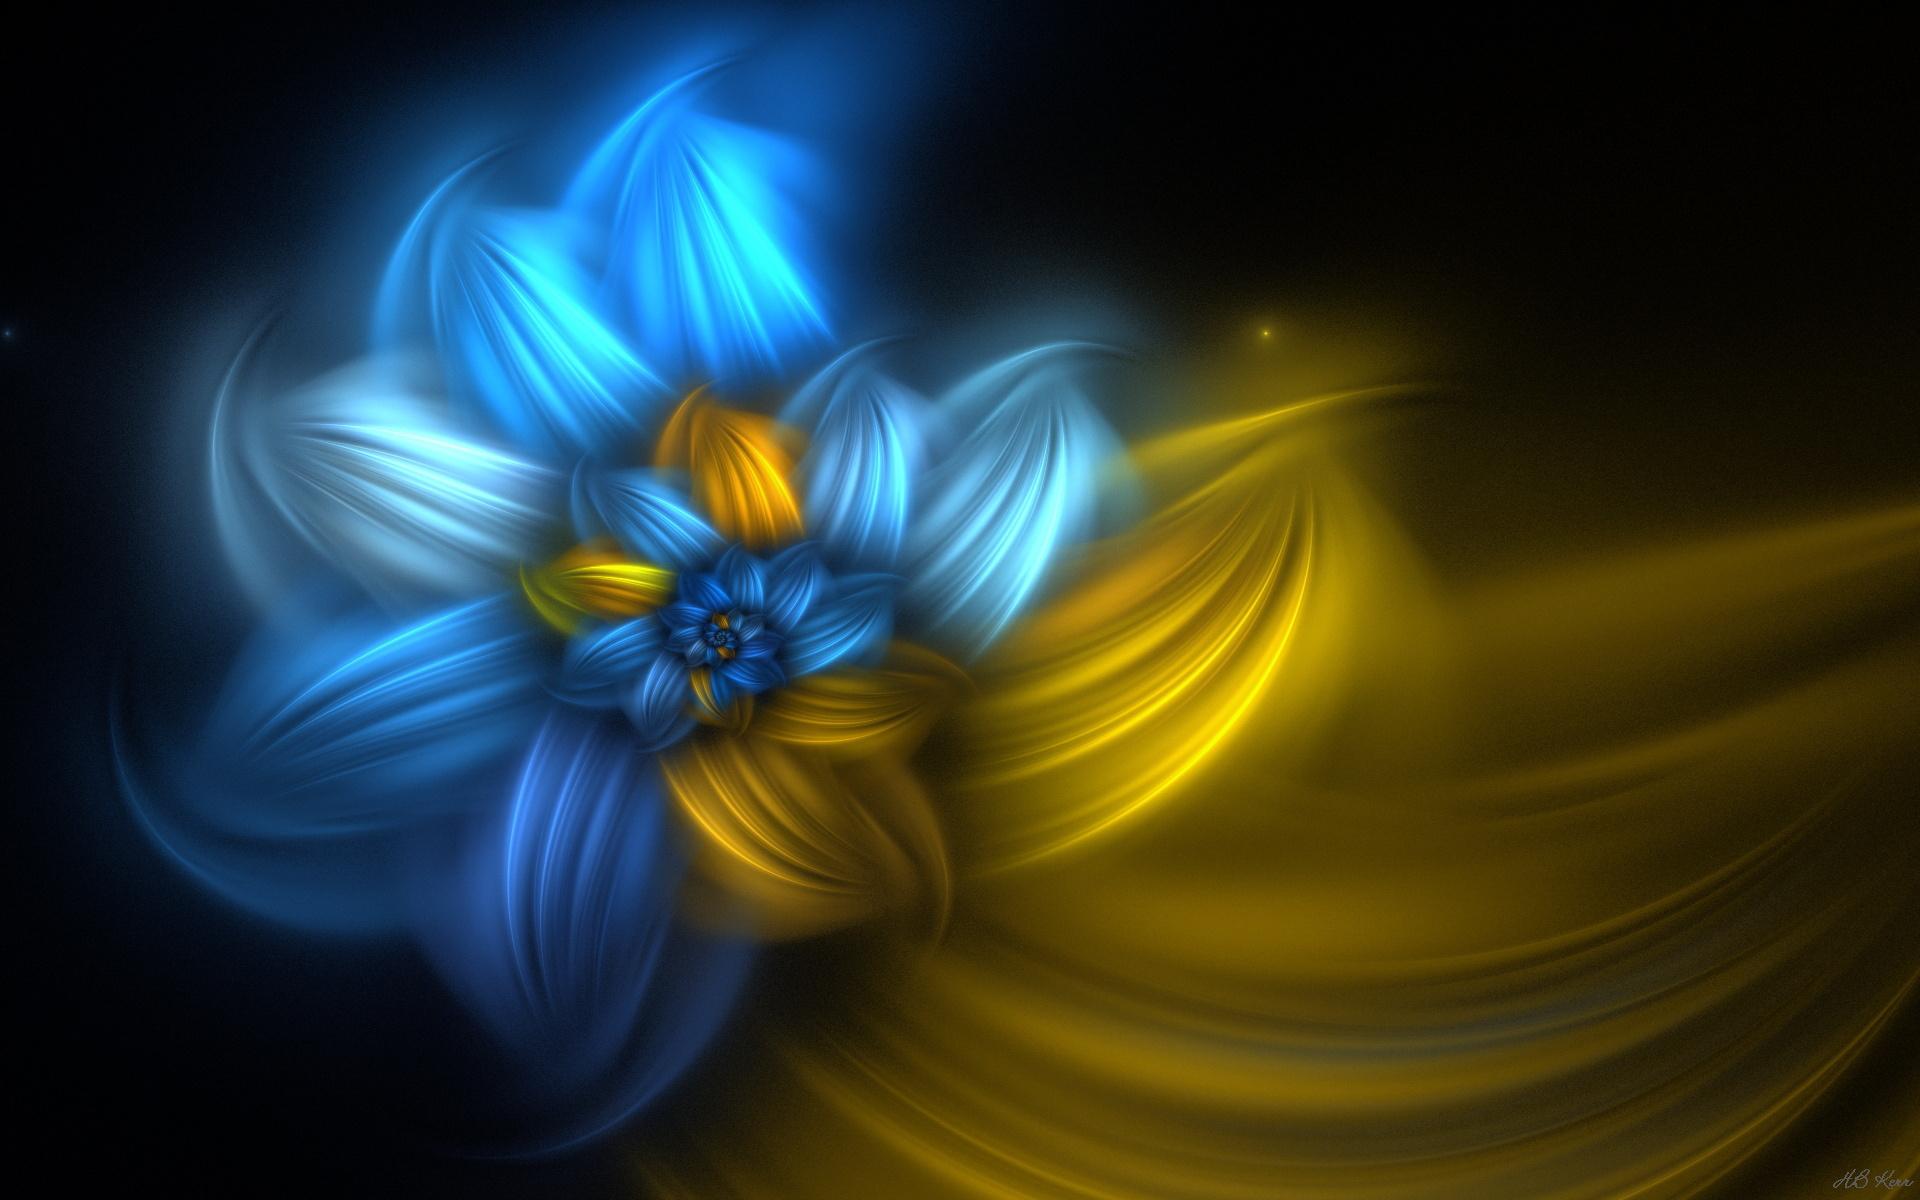 графика космос цветы роза graphics space flowers rose  № 927172 бесплатно